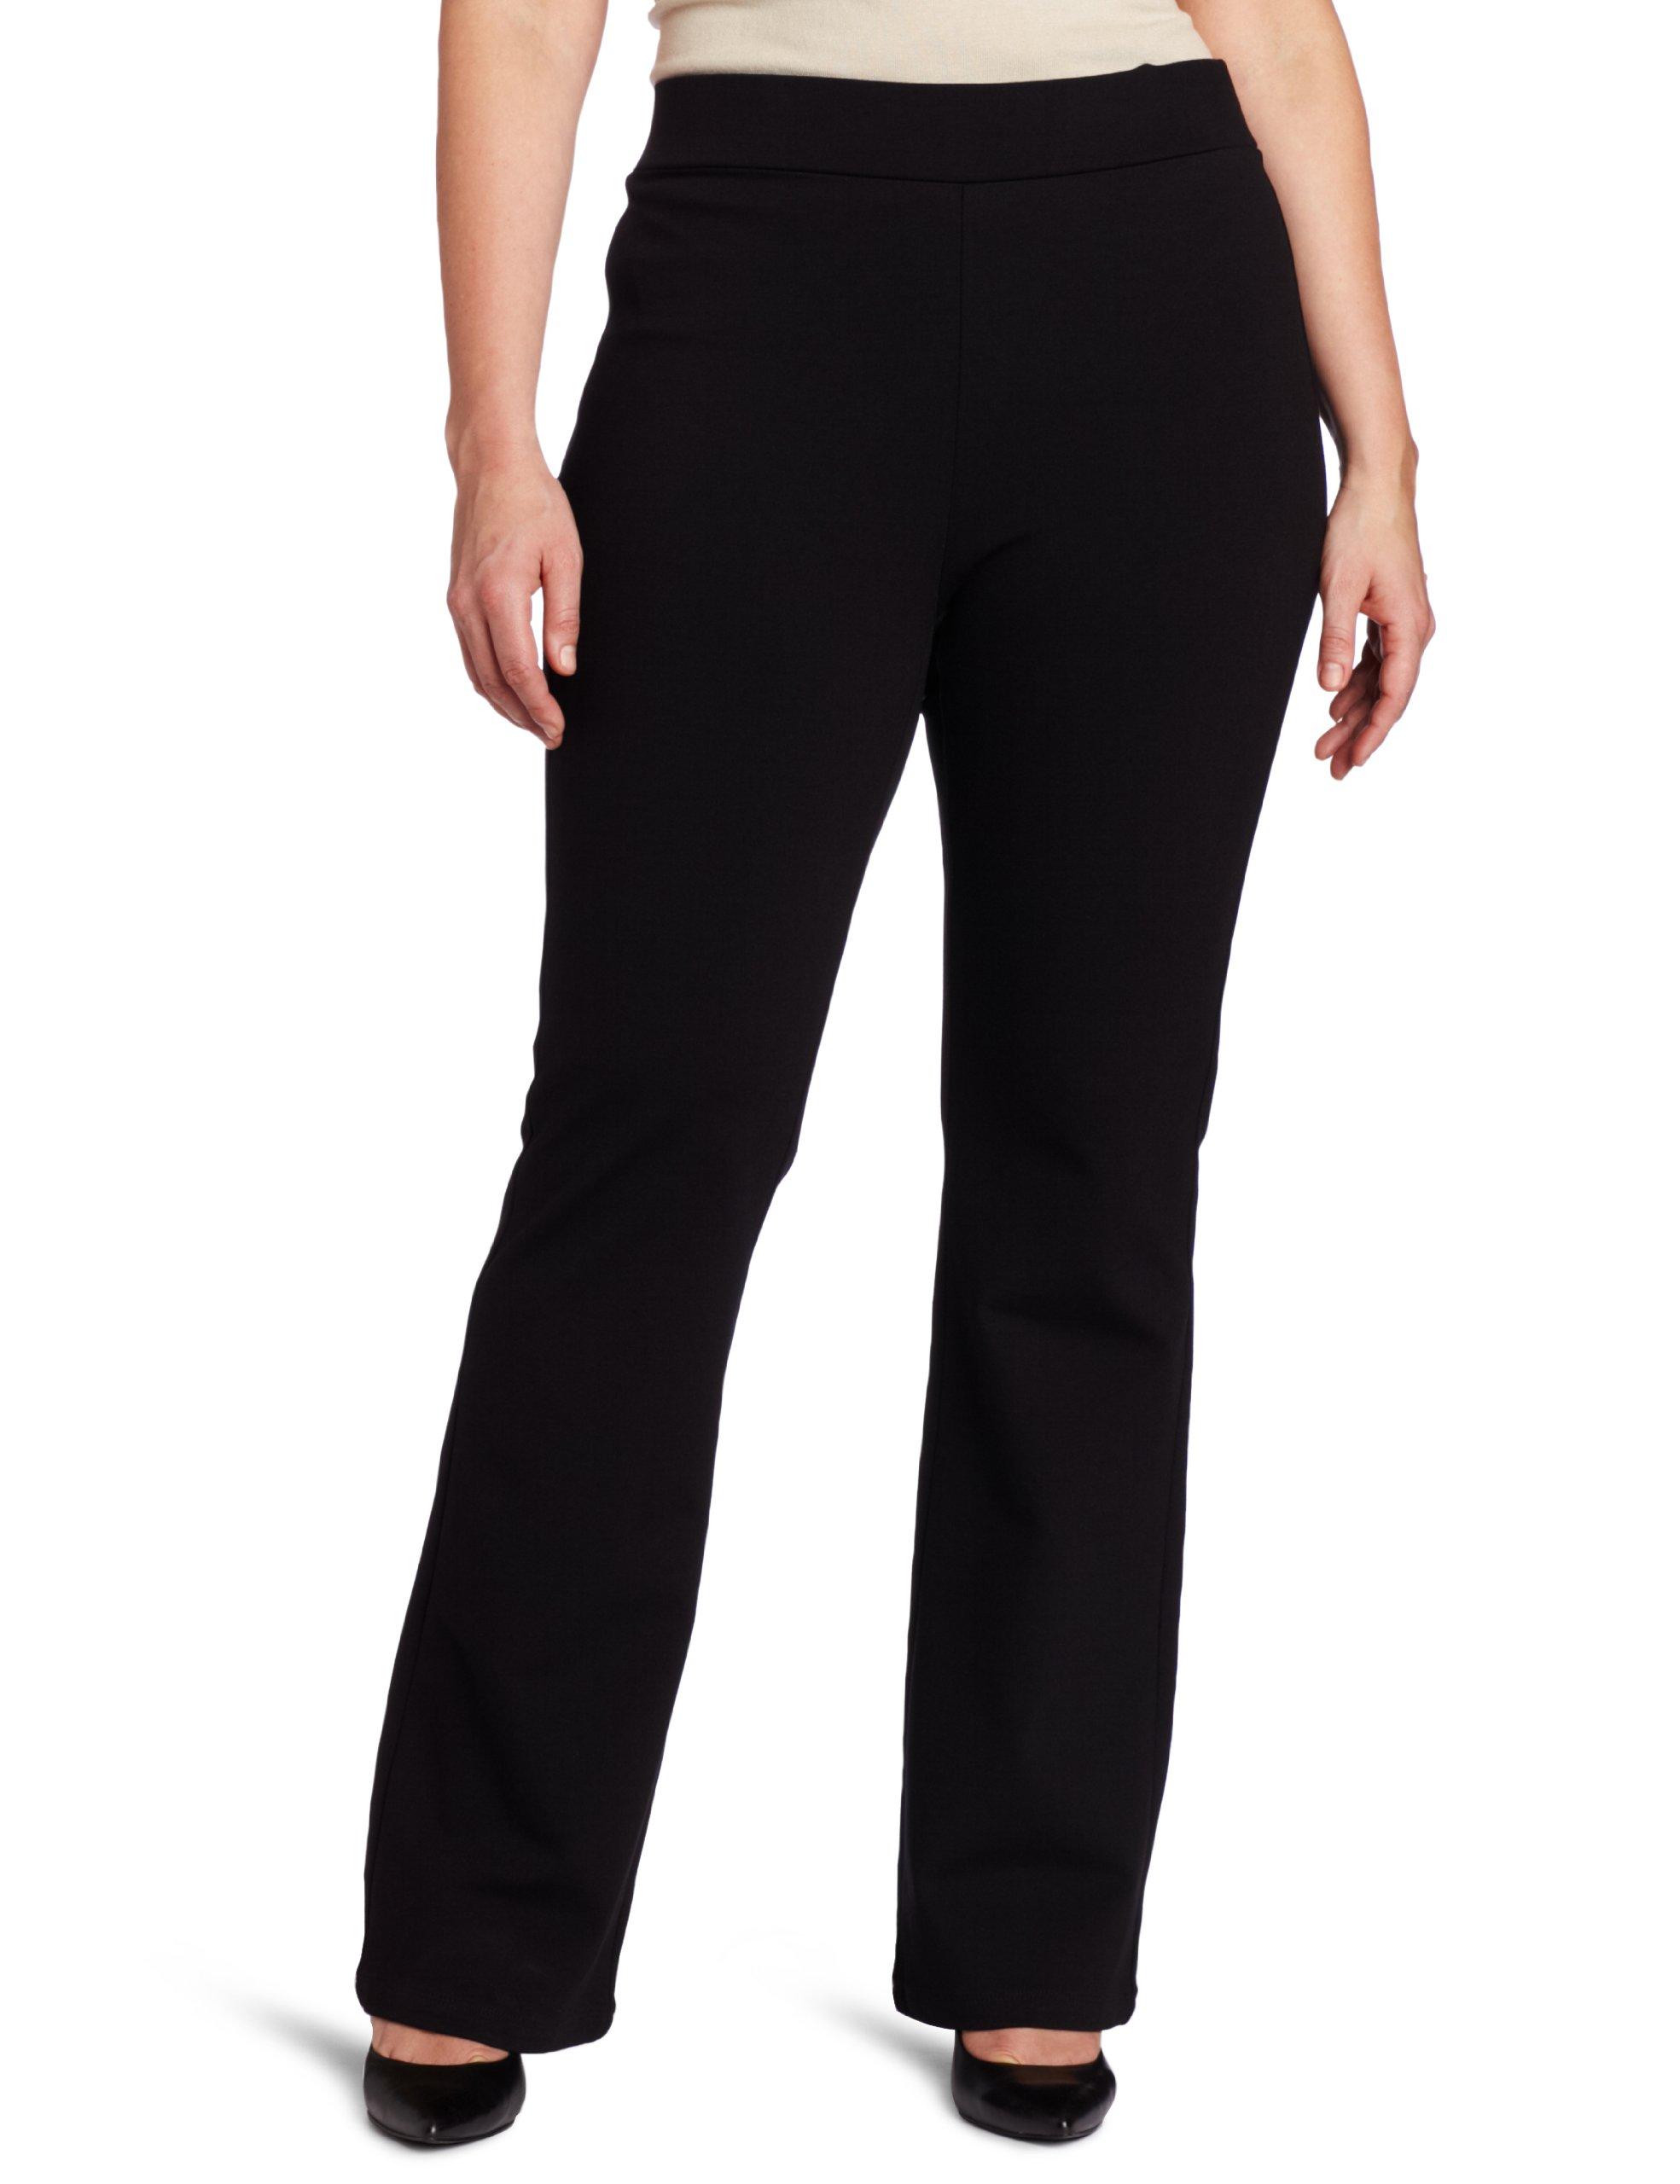 NYDJ Women's Plus-Size Belinda Ponte Bootleg Pant, Black, 20W